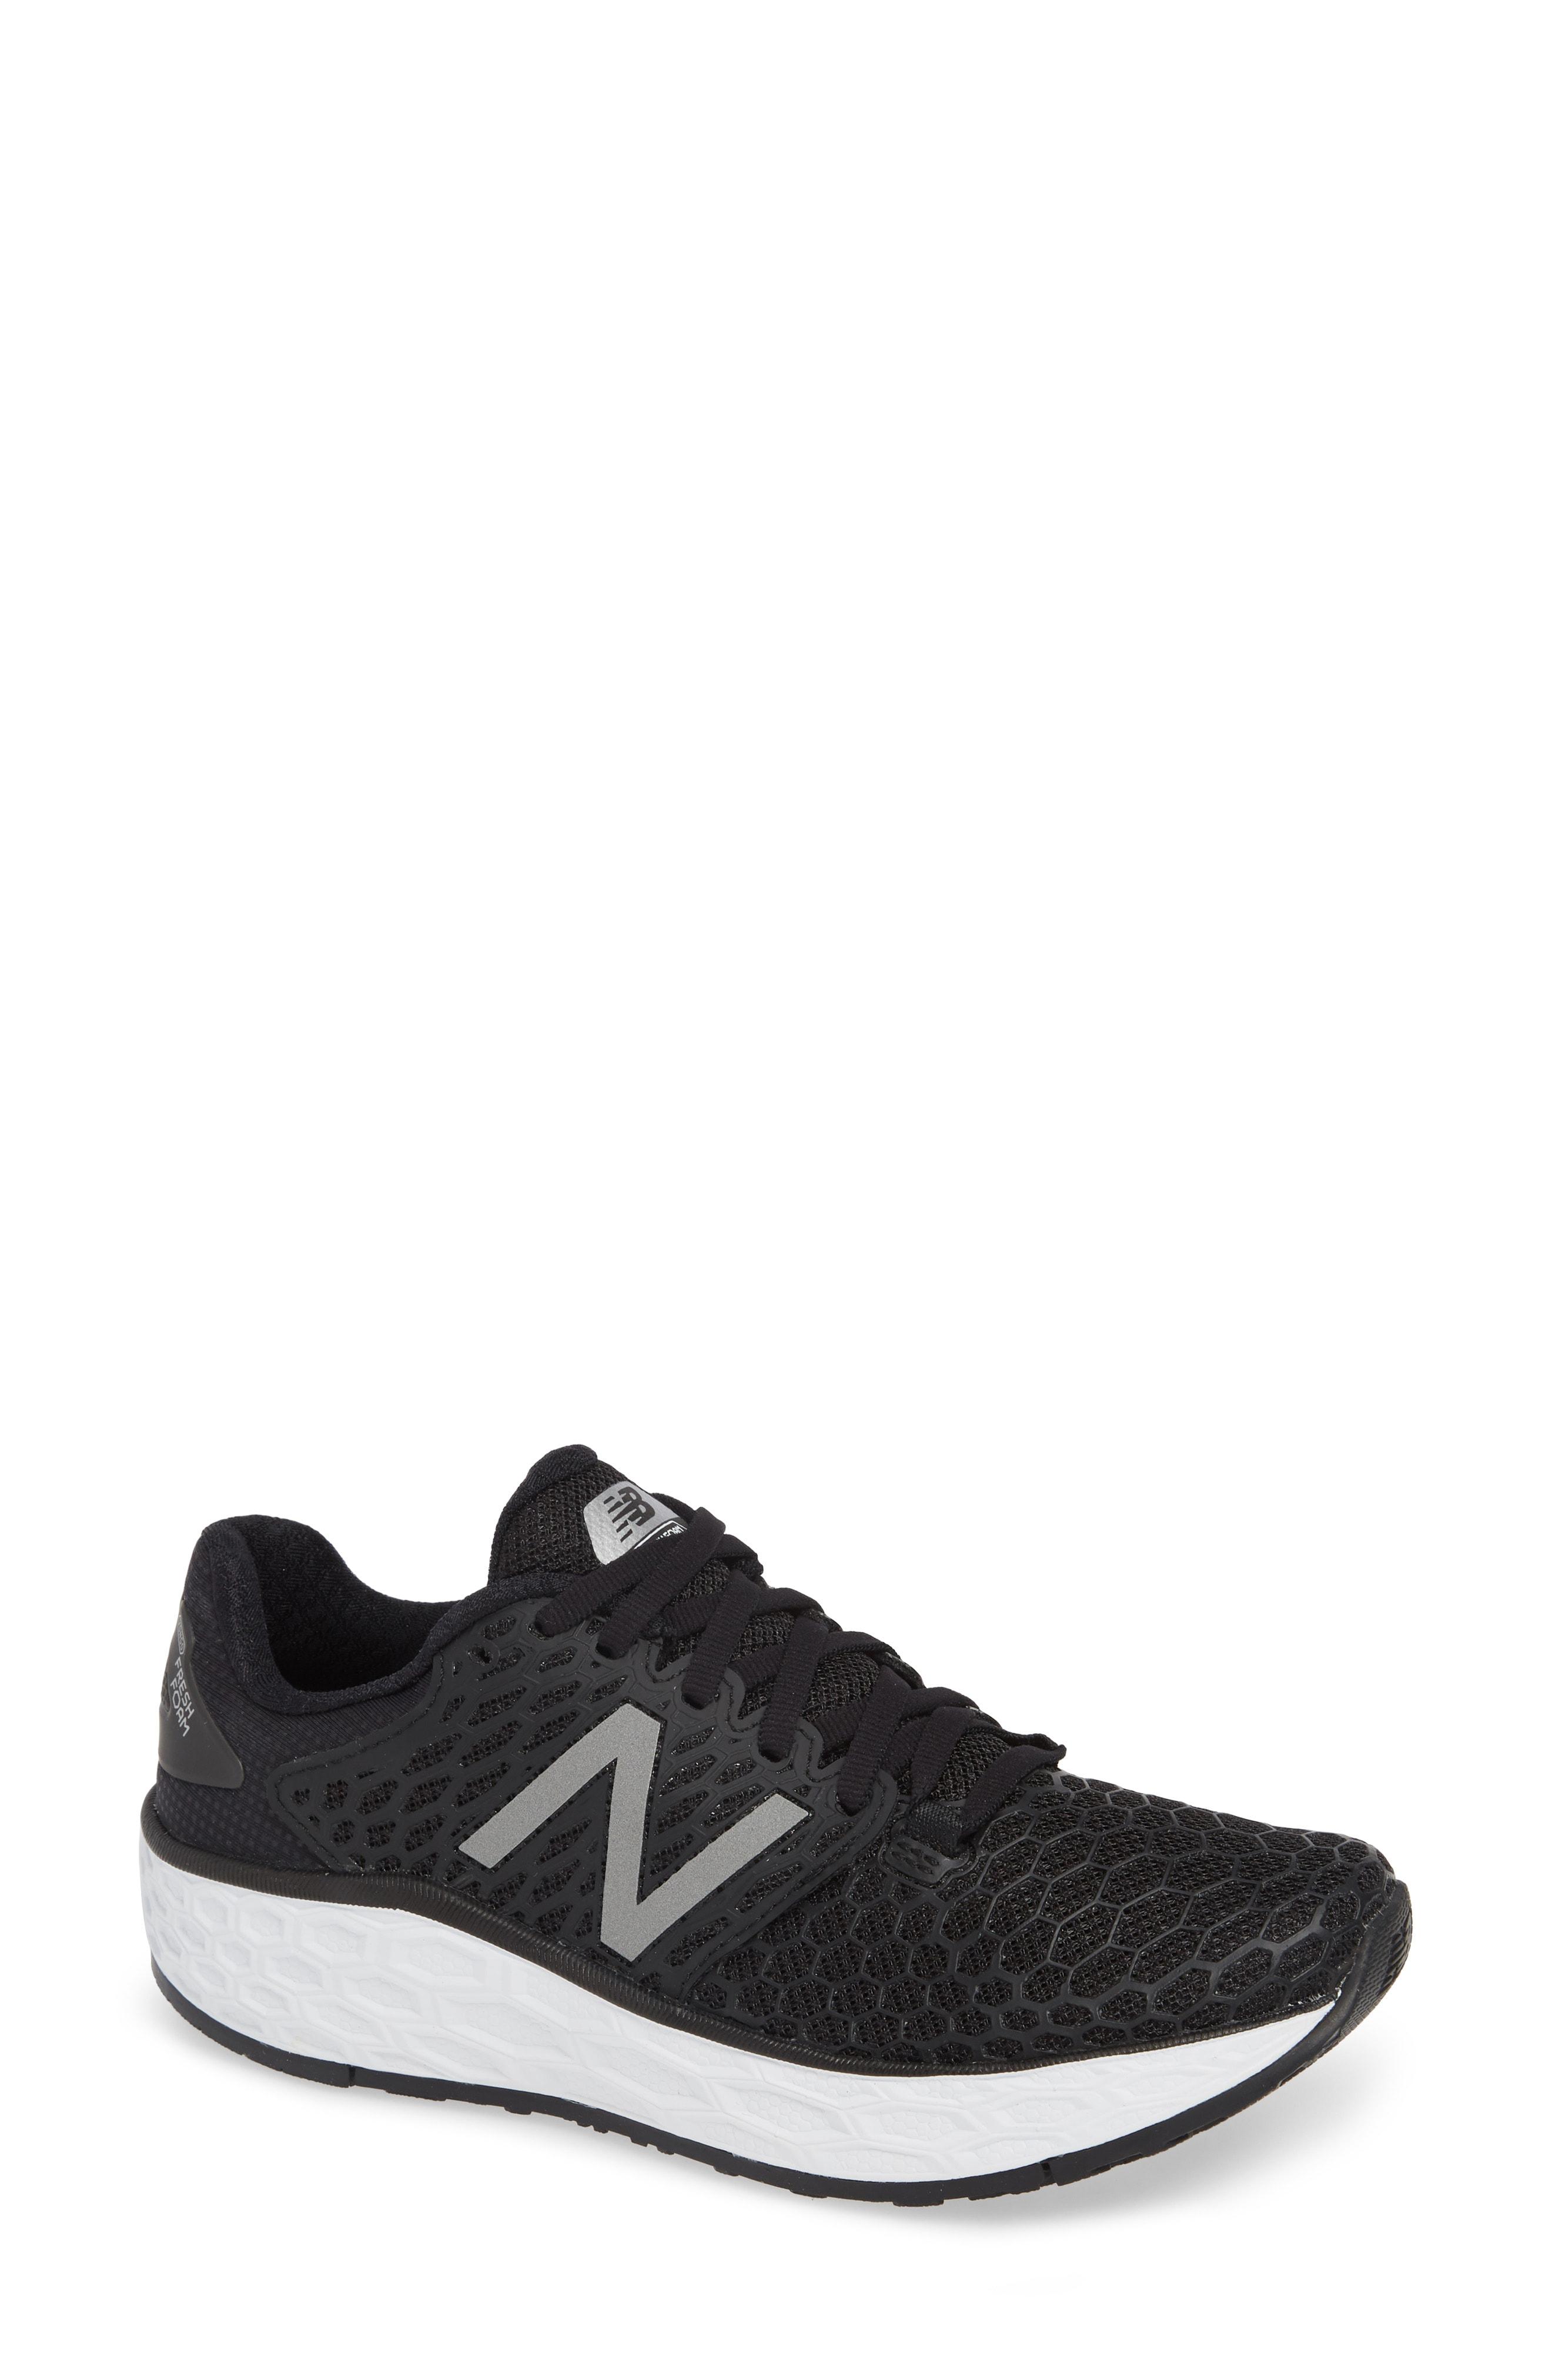 New Balance Fresh Foam Vongo Running Shoe (Women)